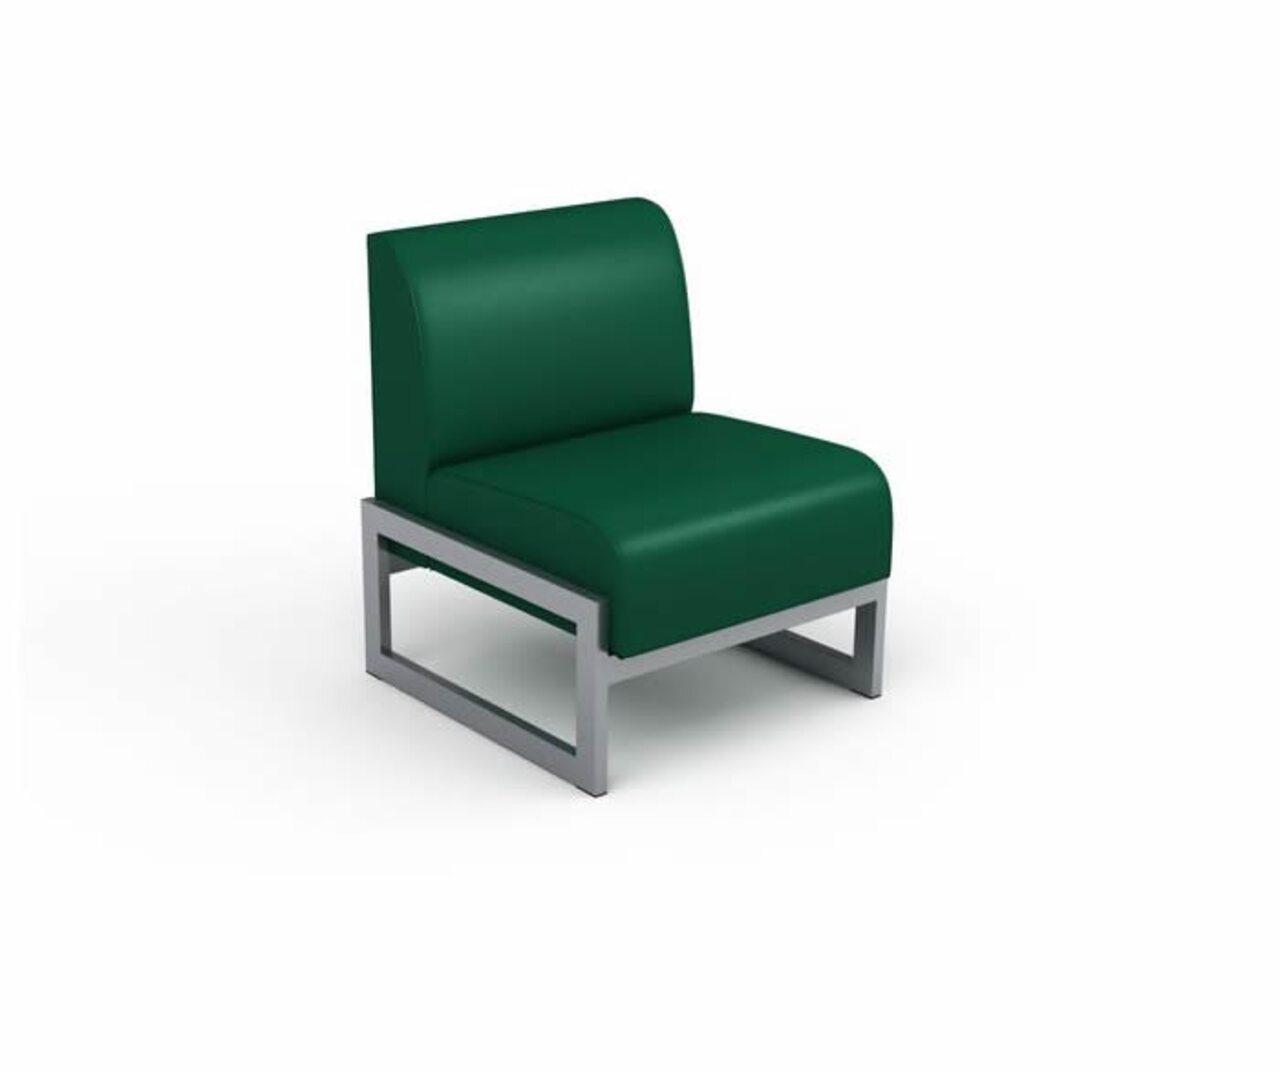 Кресло  Сигма-люкс 66x69x78 - фото 1